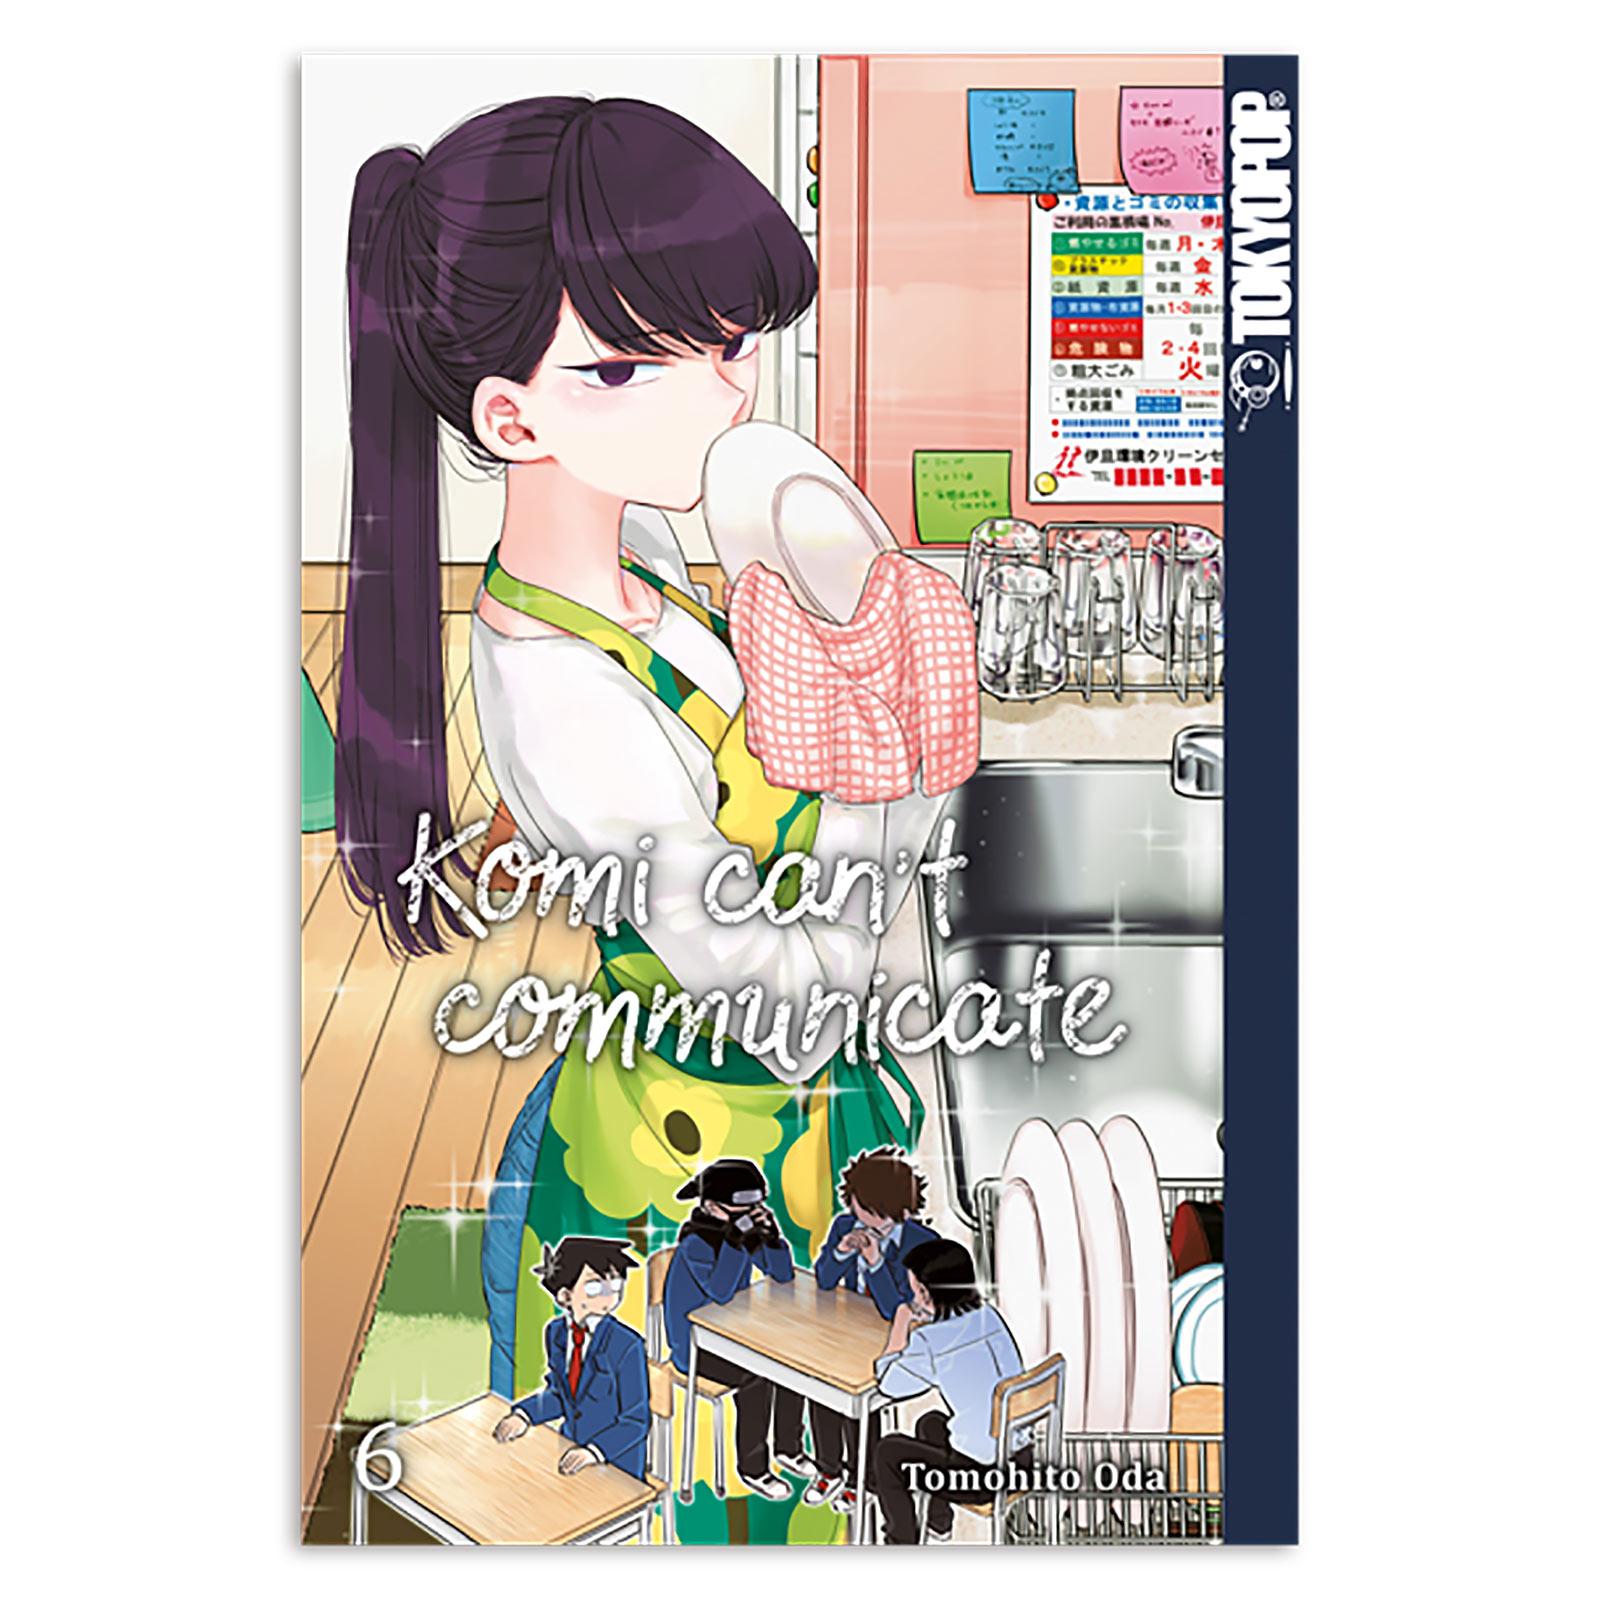 Komi can't communicate - Band 6 Taschenbuch